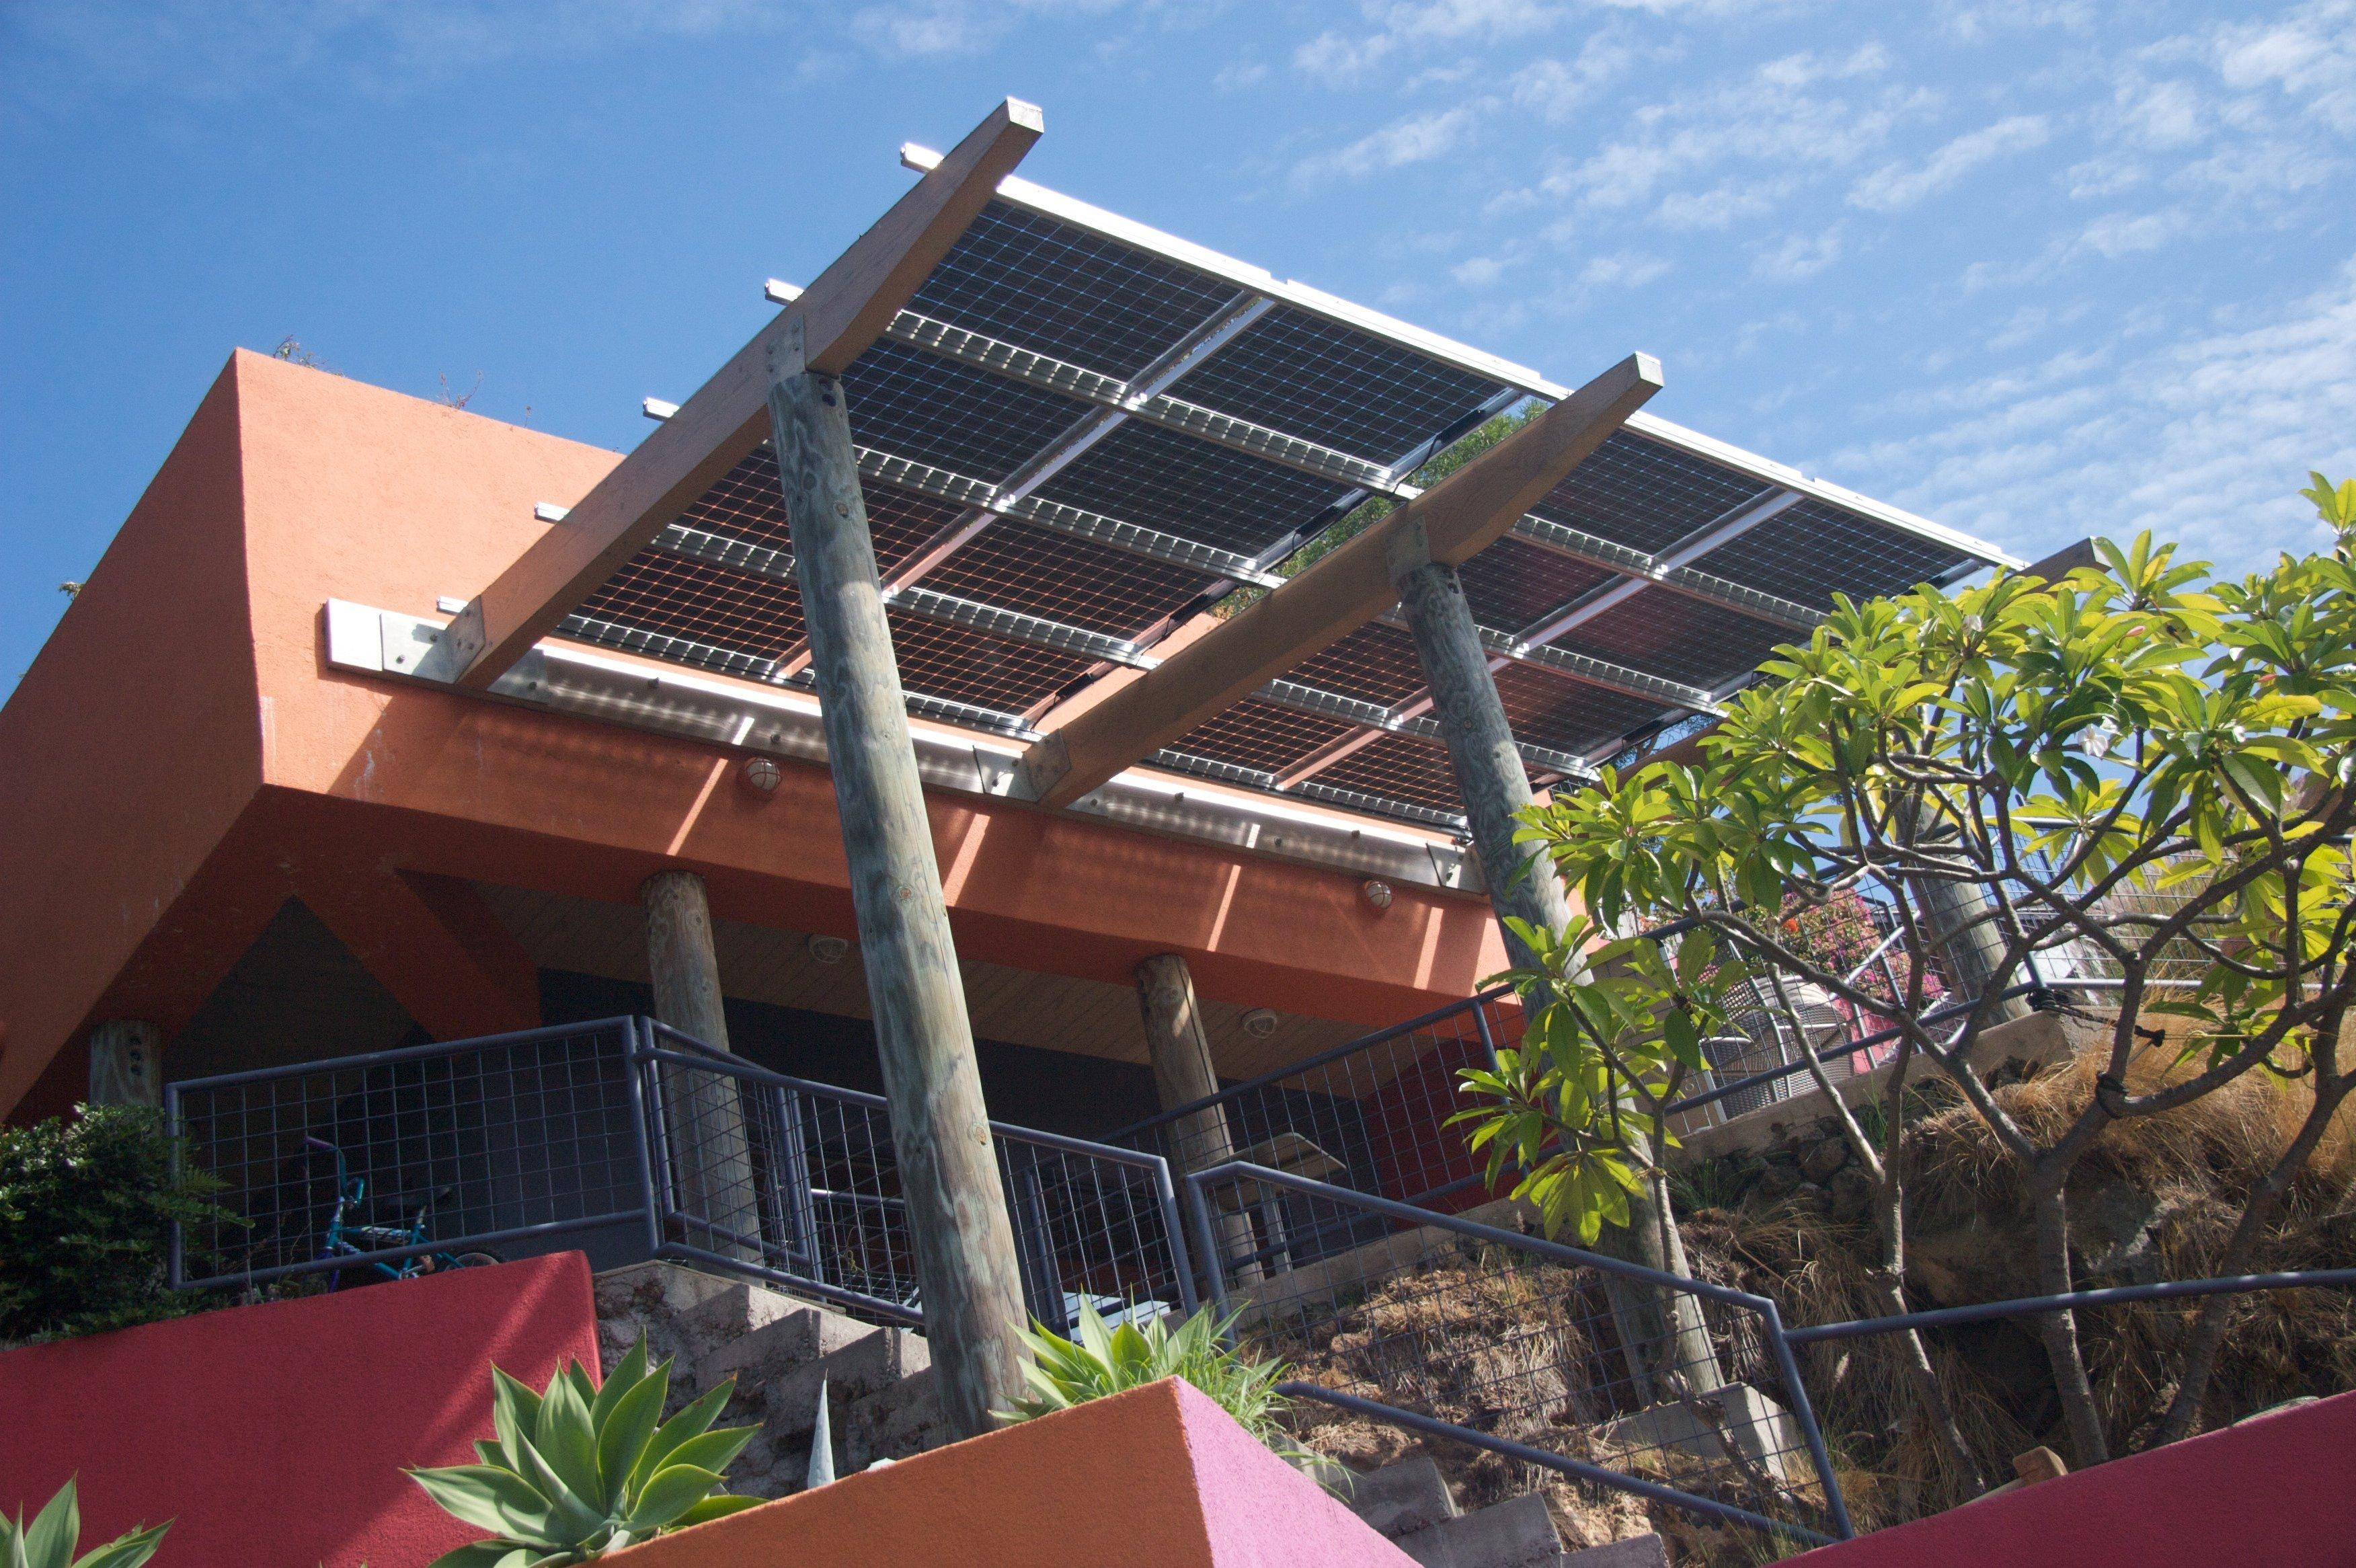 3.04 KW solar grid installed on rooftop in Honokaa, HI